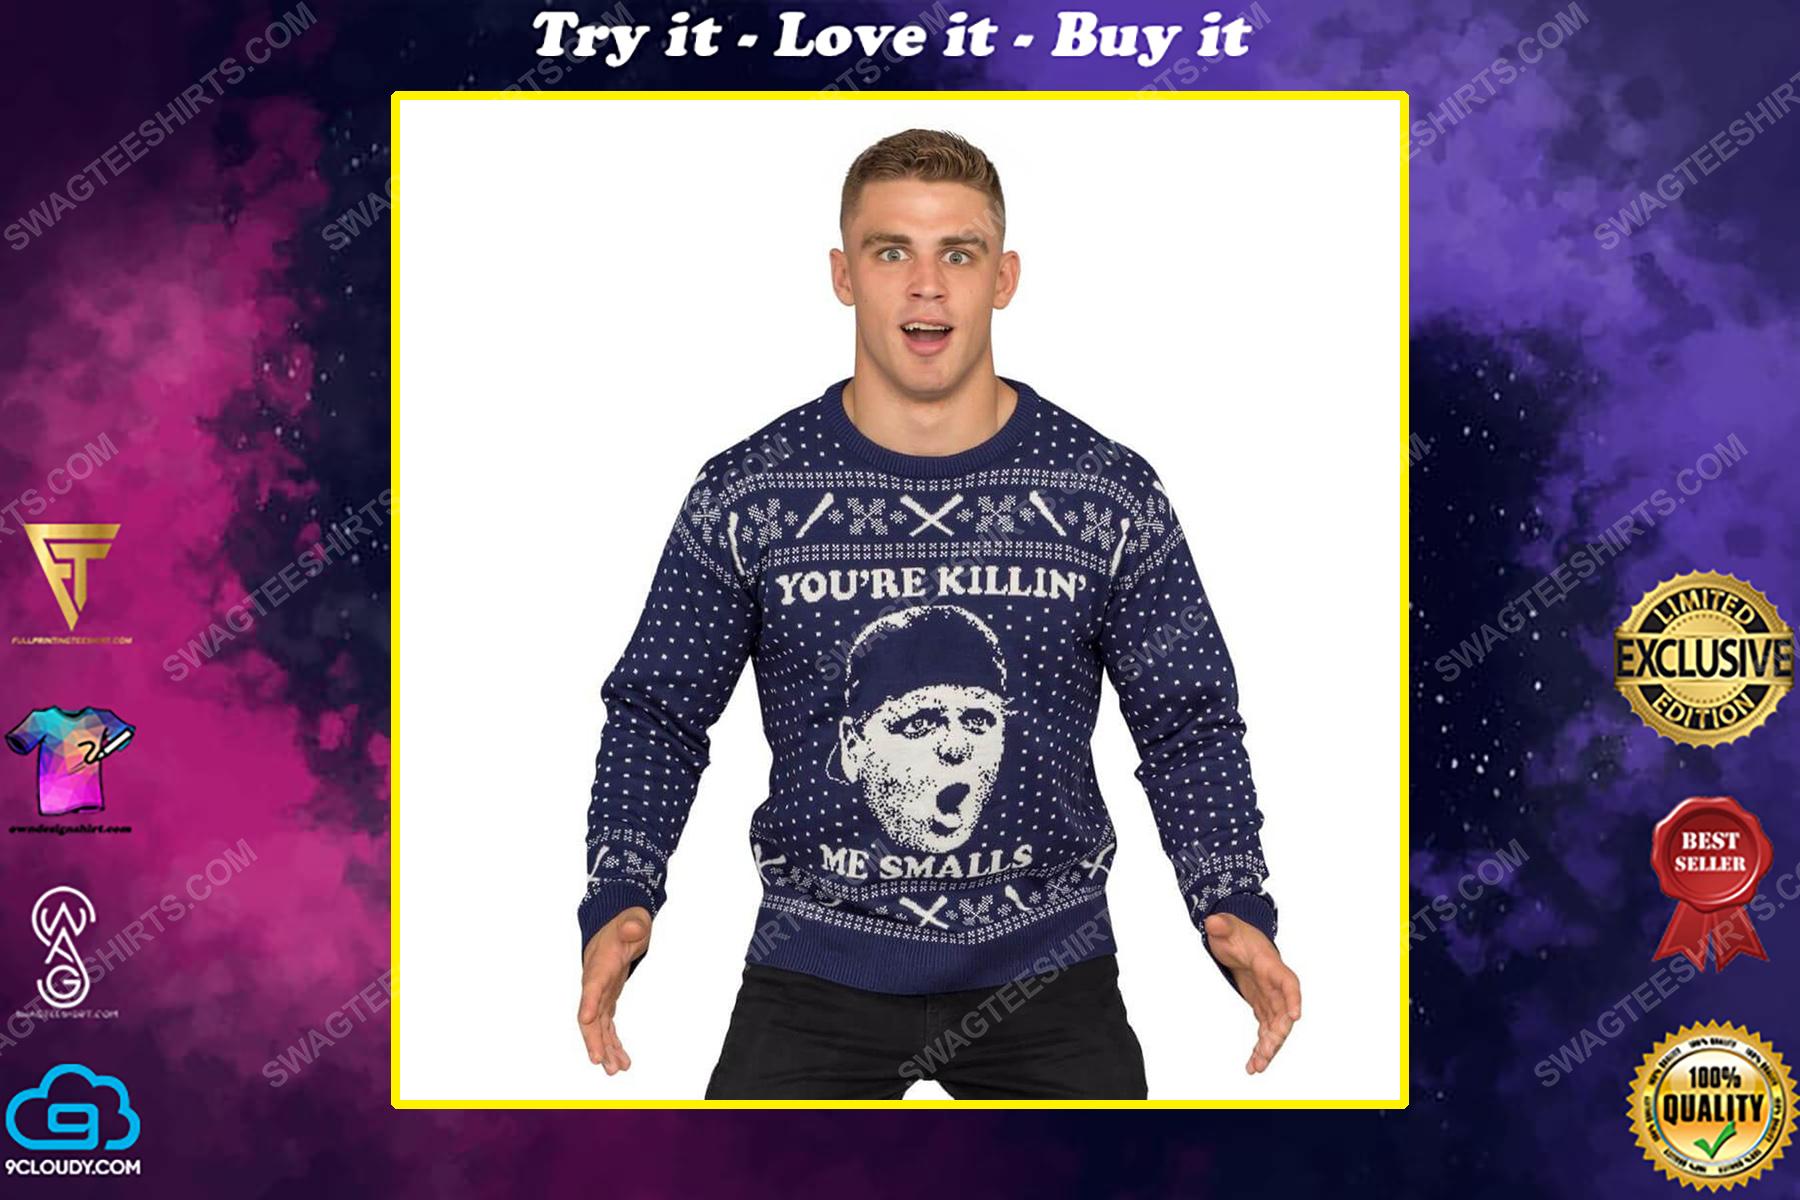 The sandlot you're killin me smalls full print ugly christmas sweater